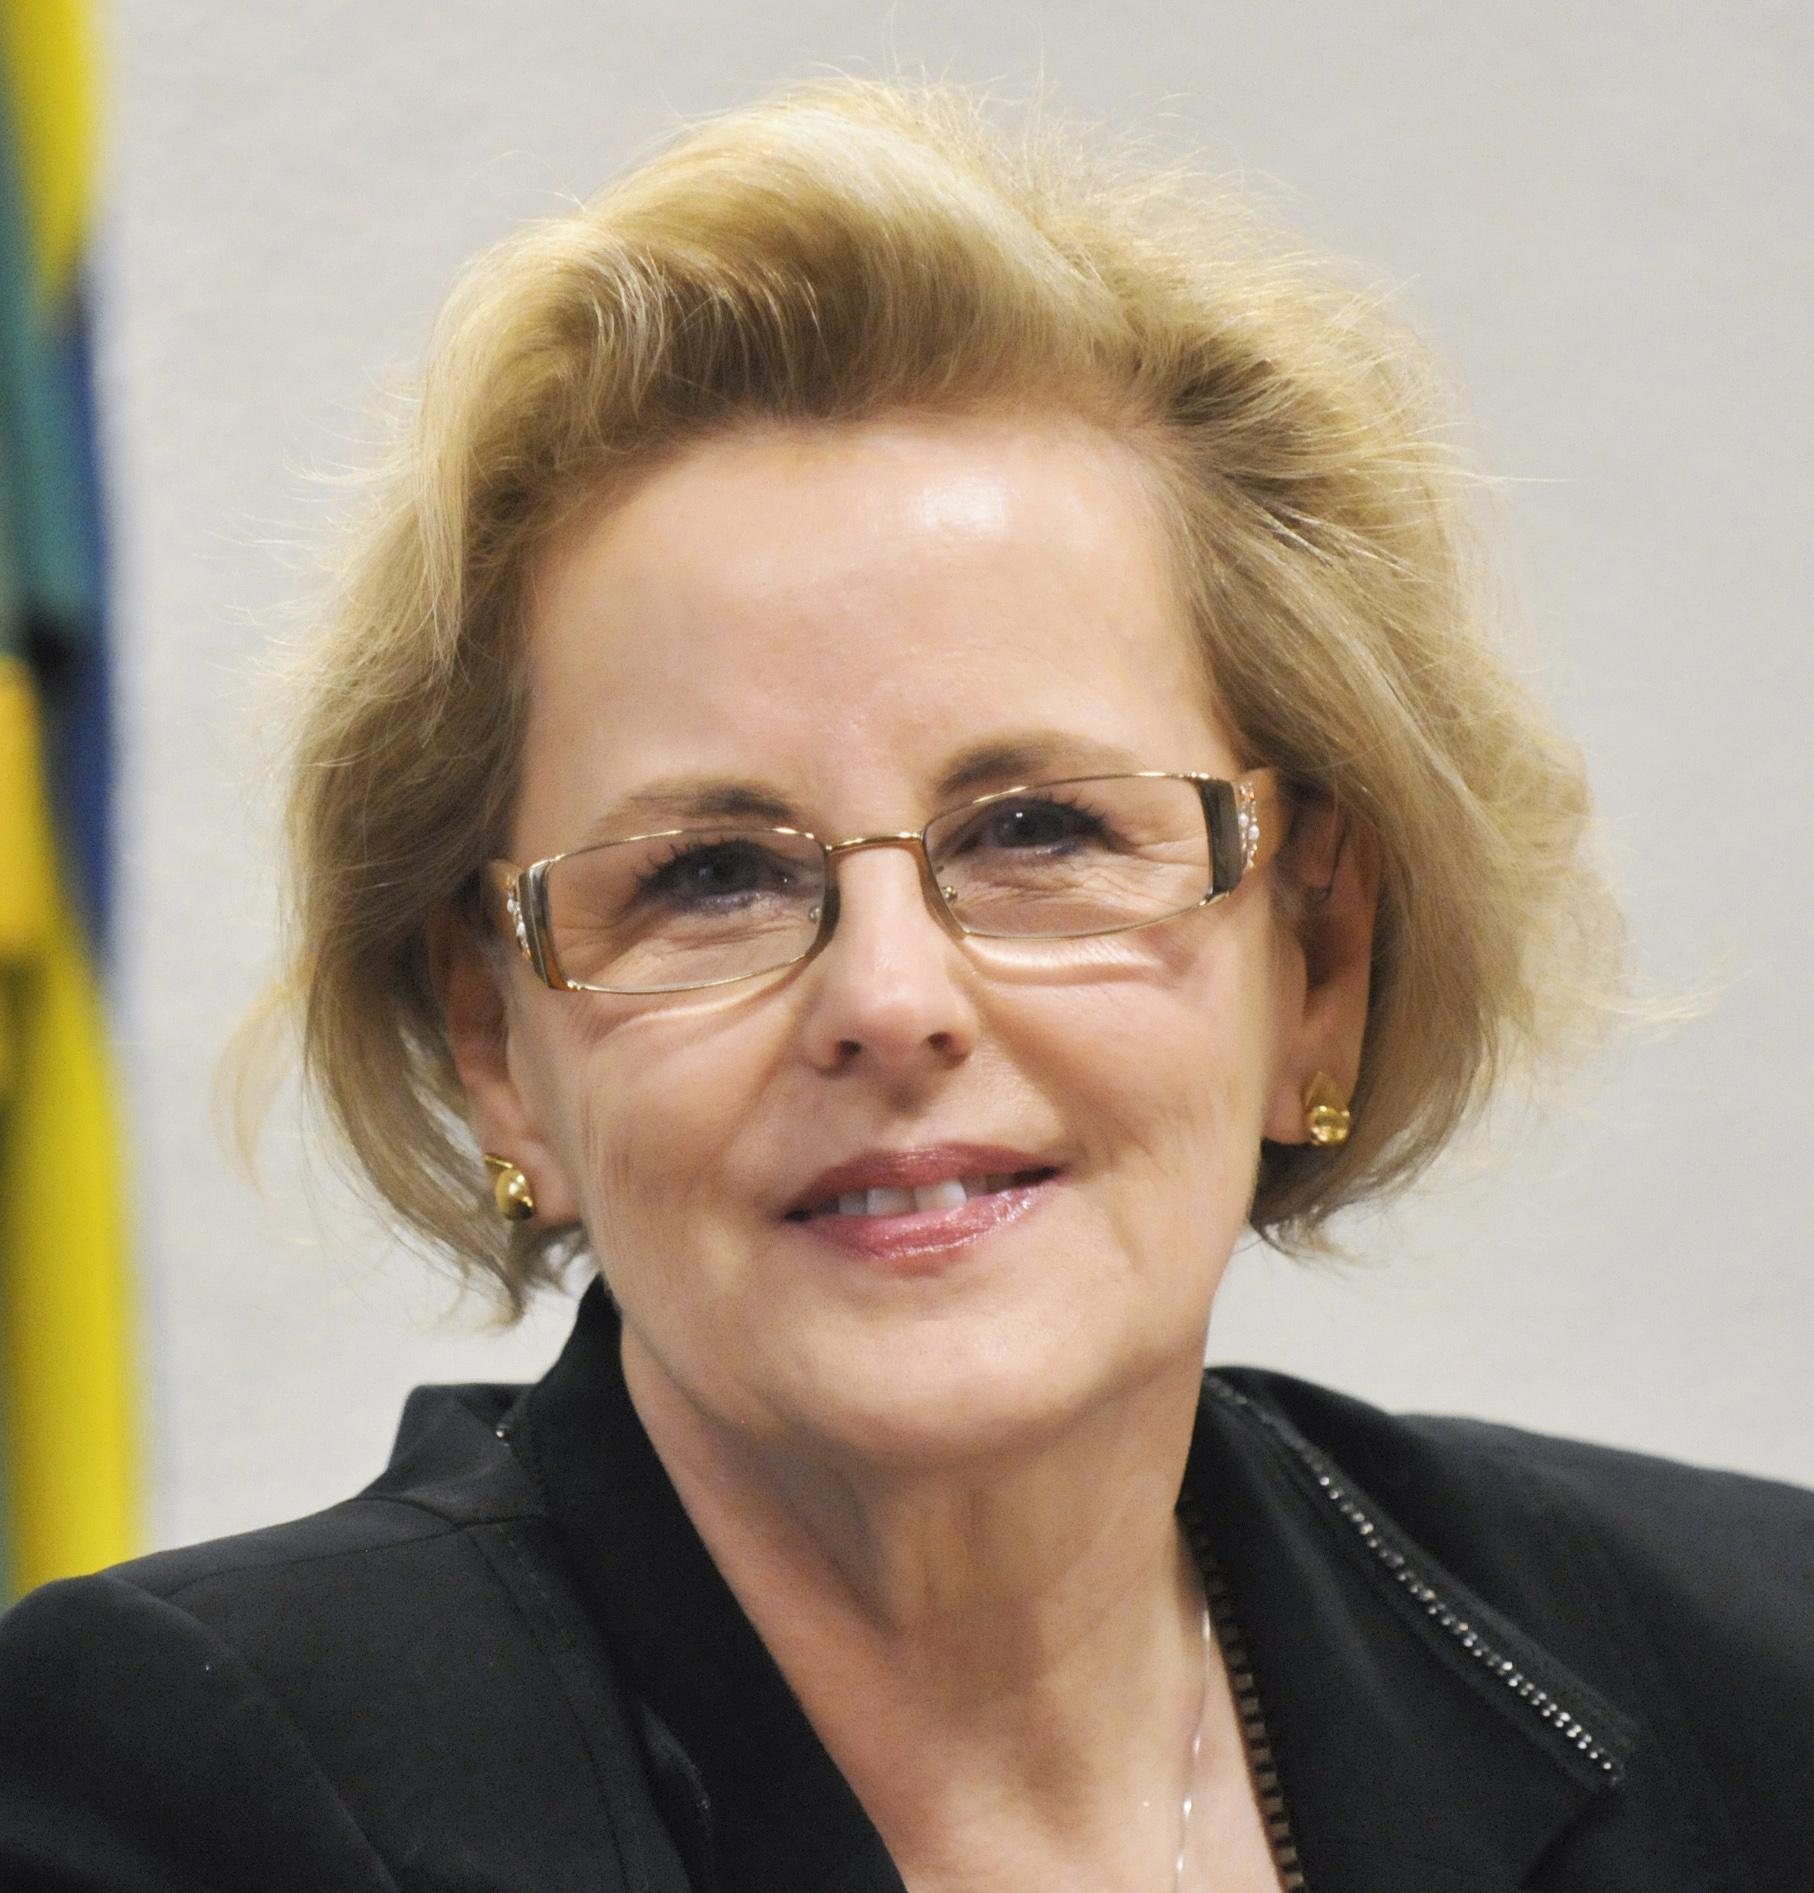 Rosa Maria Weber Candiota da Rosa